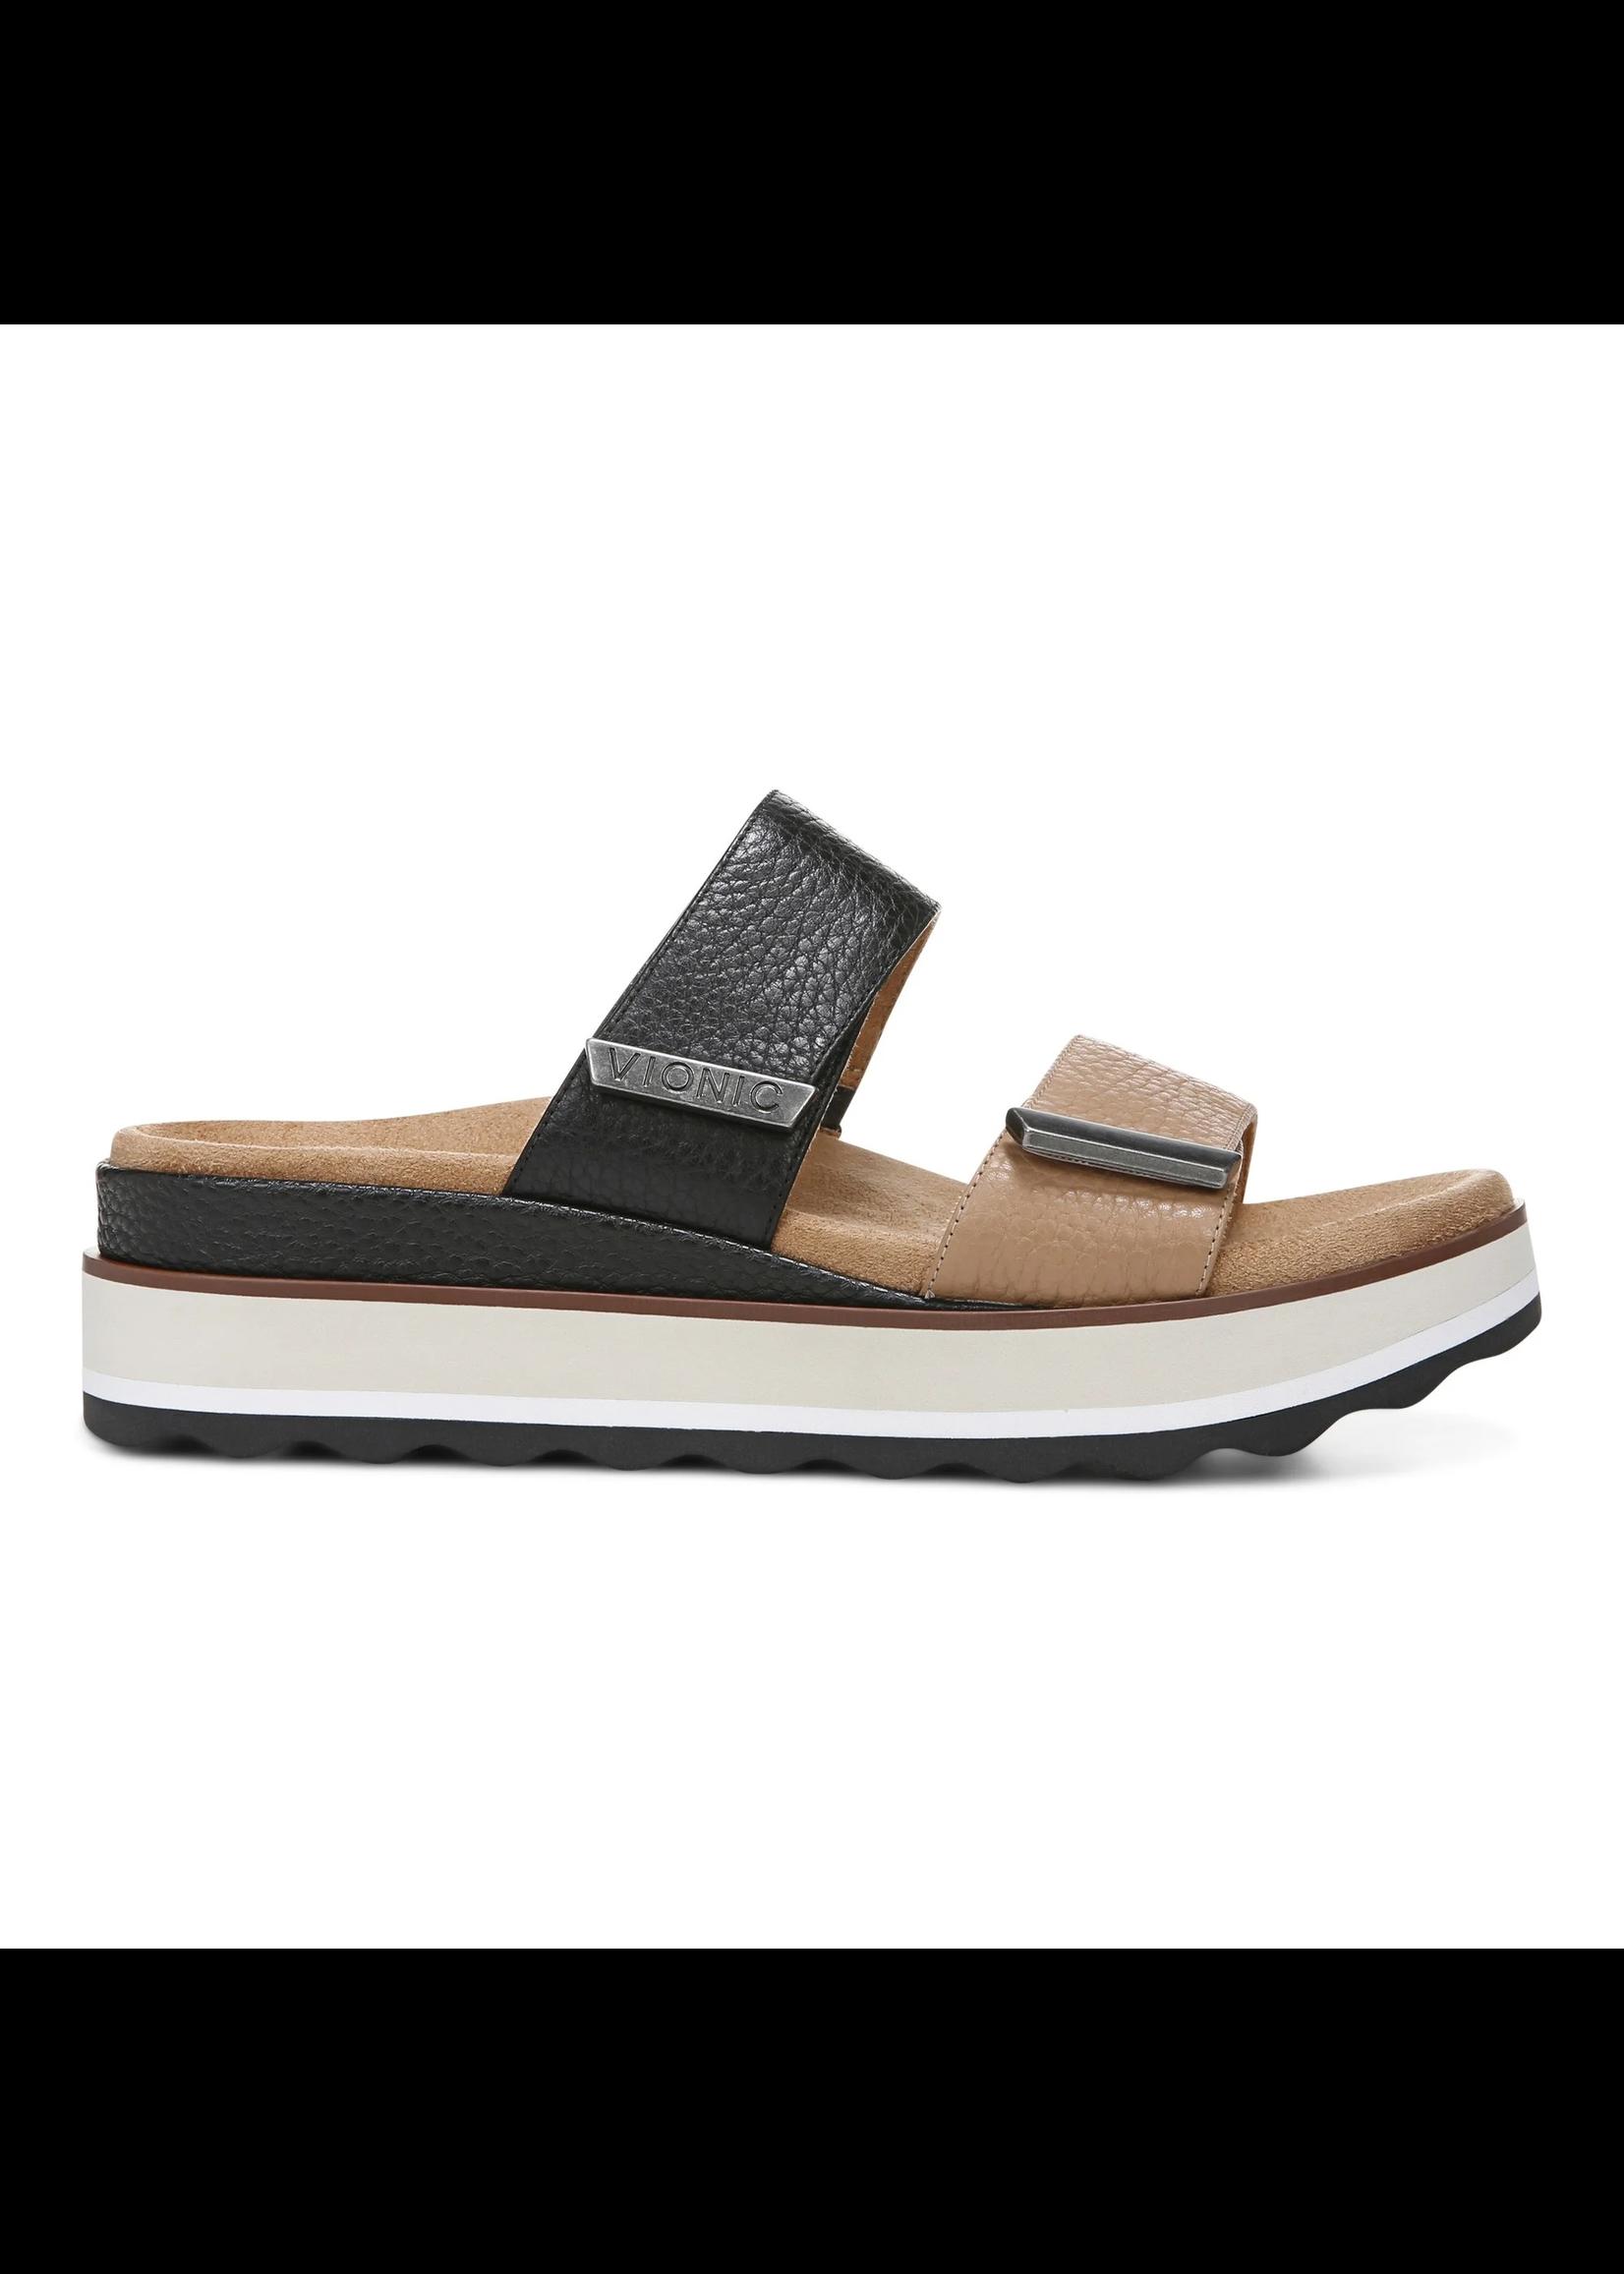 Vionic Brandie Flatform Sandal